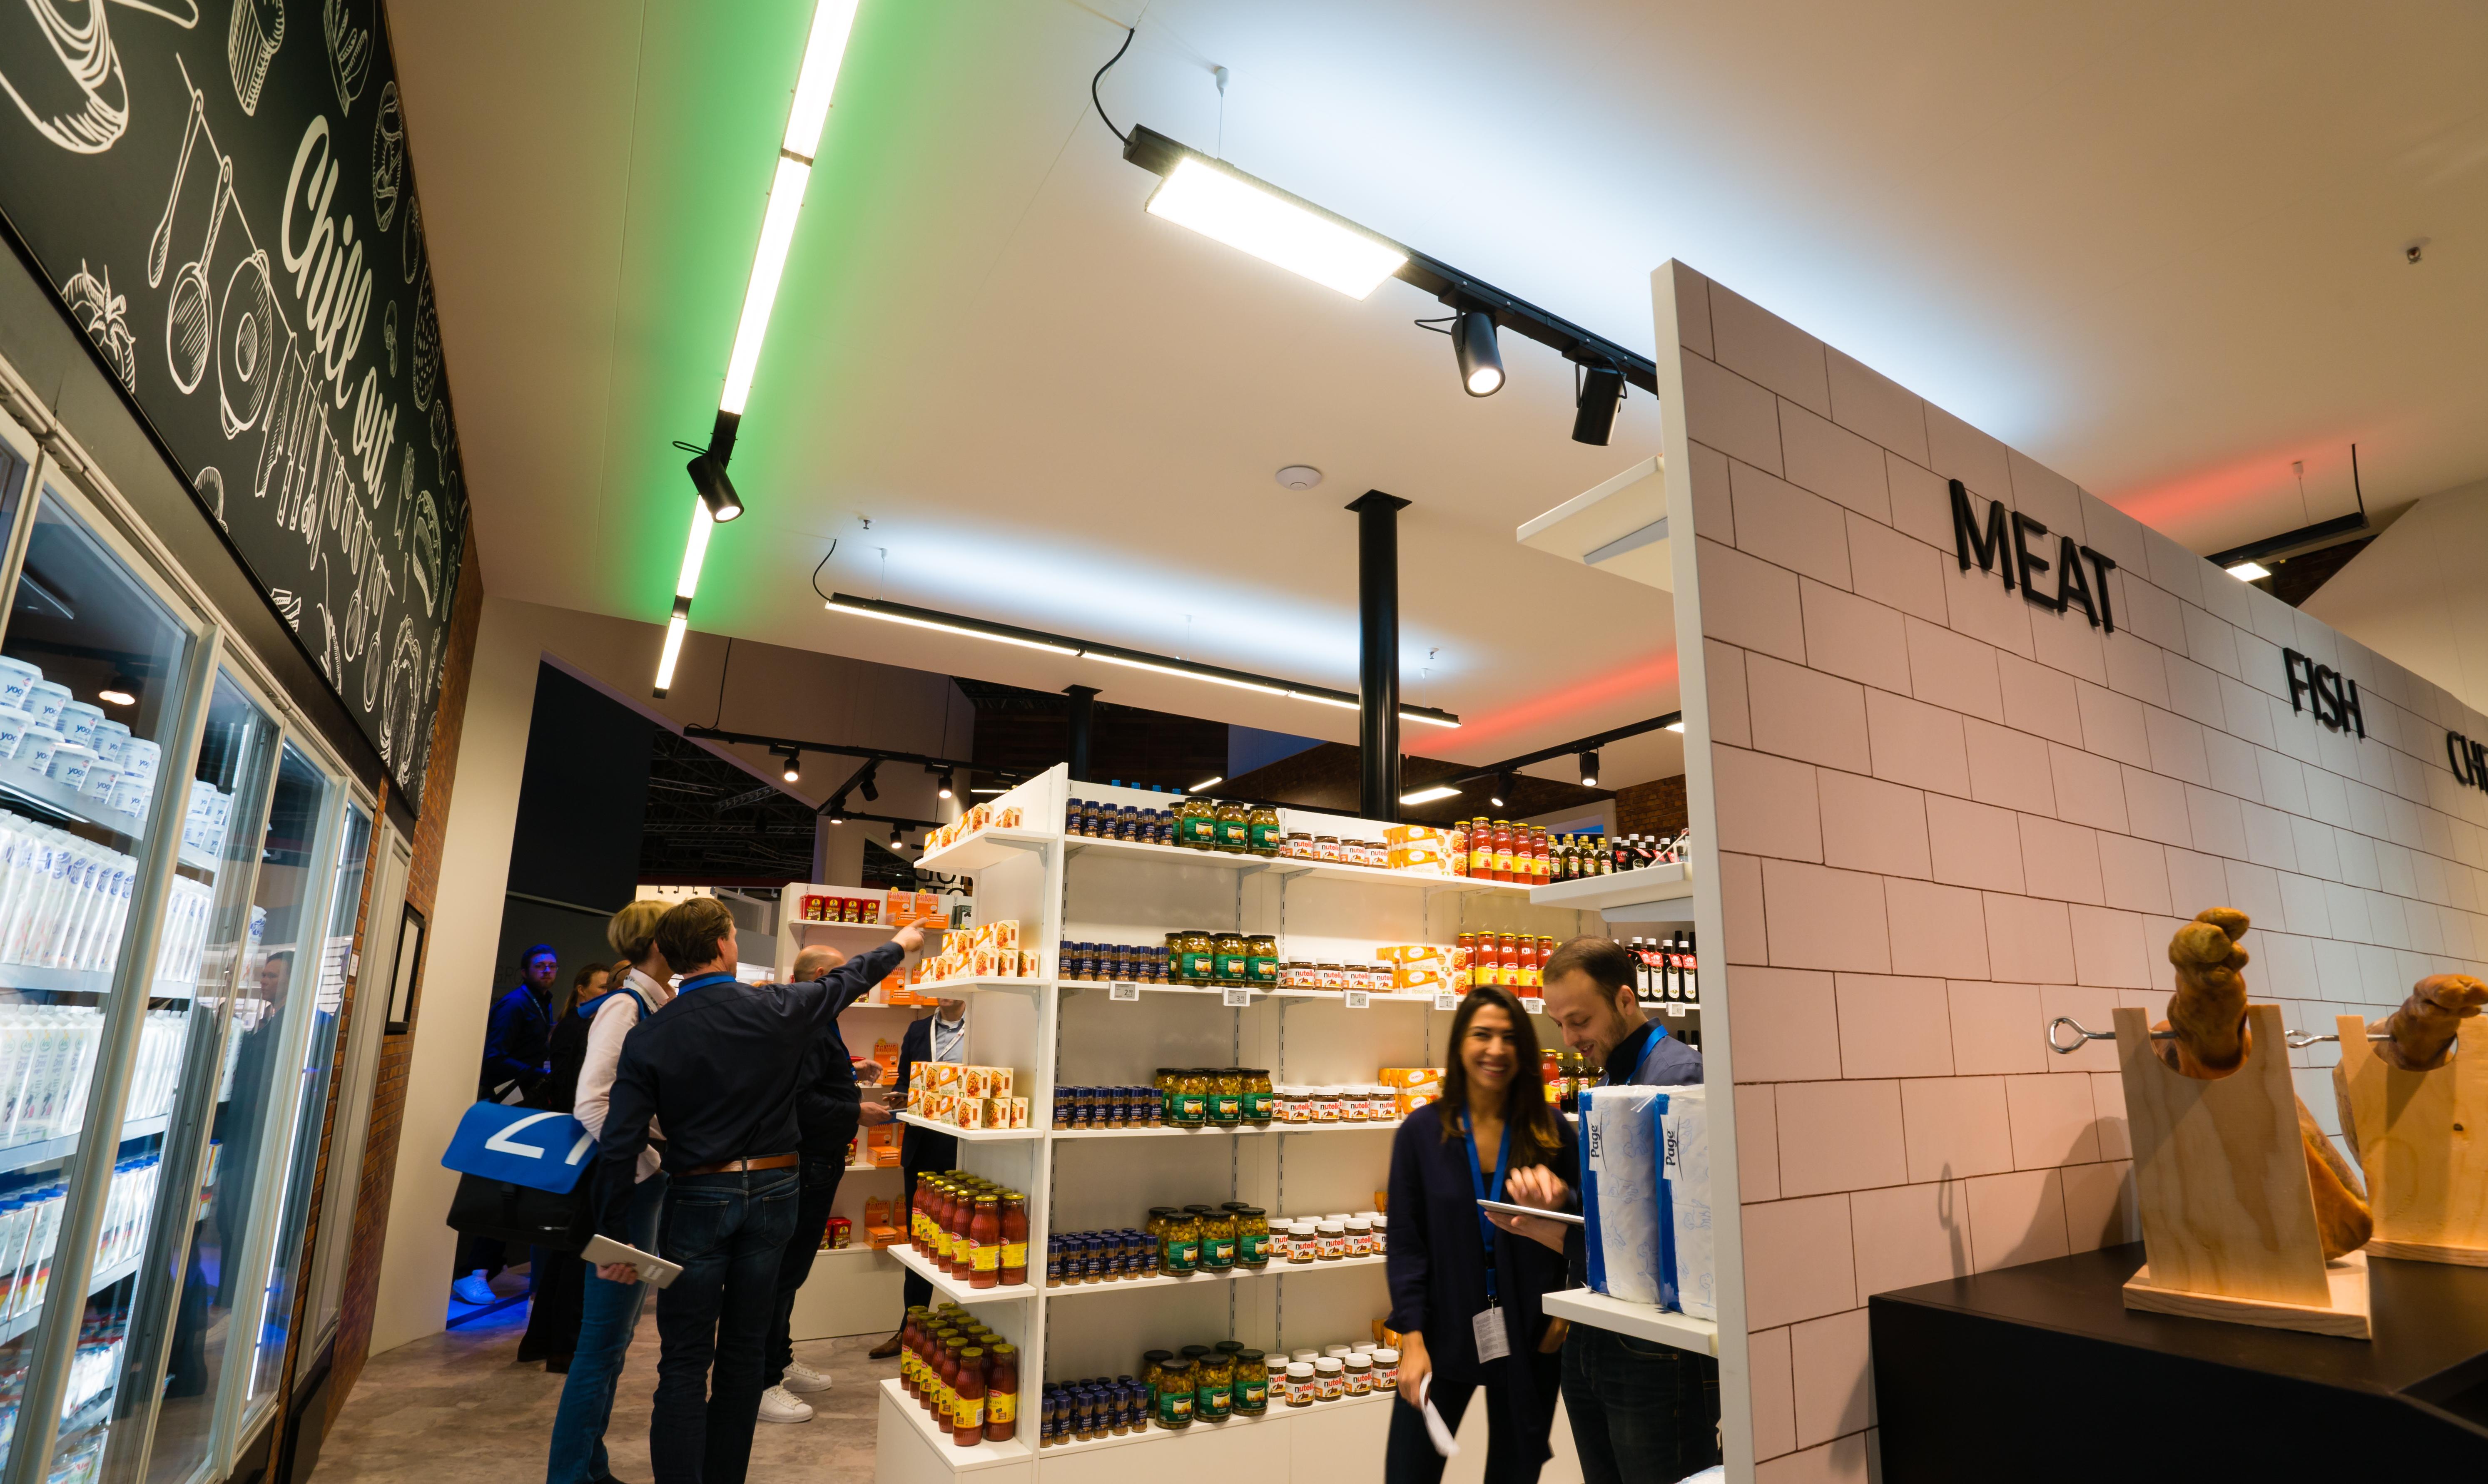 philips lighting cracks code of shopper behavior proving how colored lighting boosts supermarket